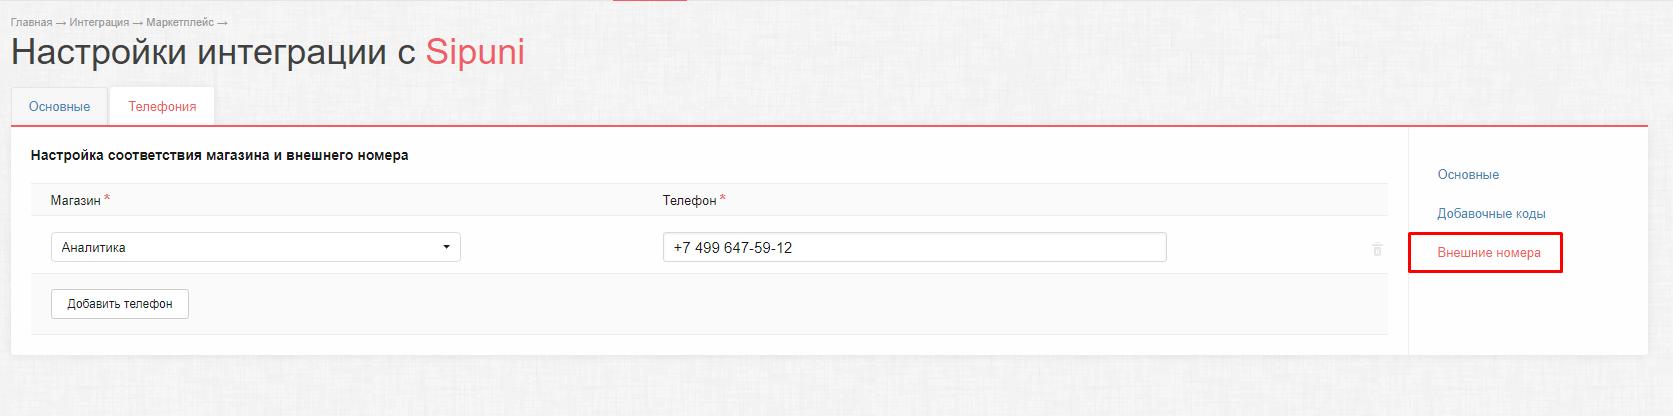 Screenshot_36.png